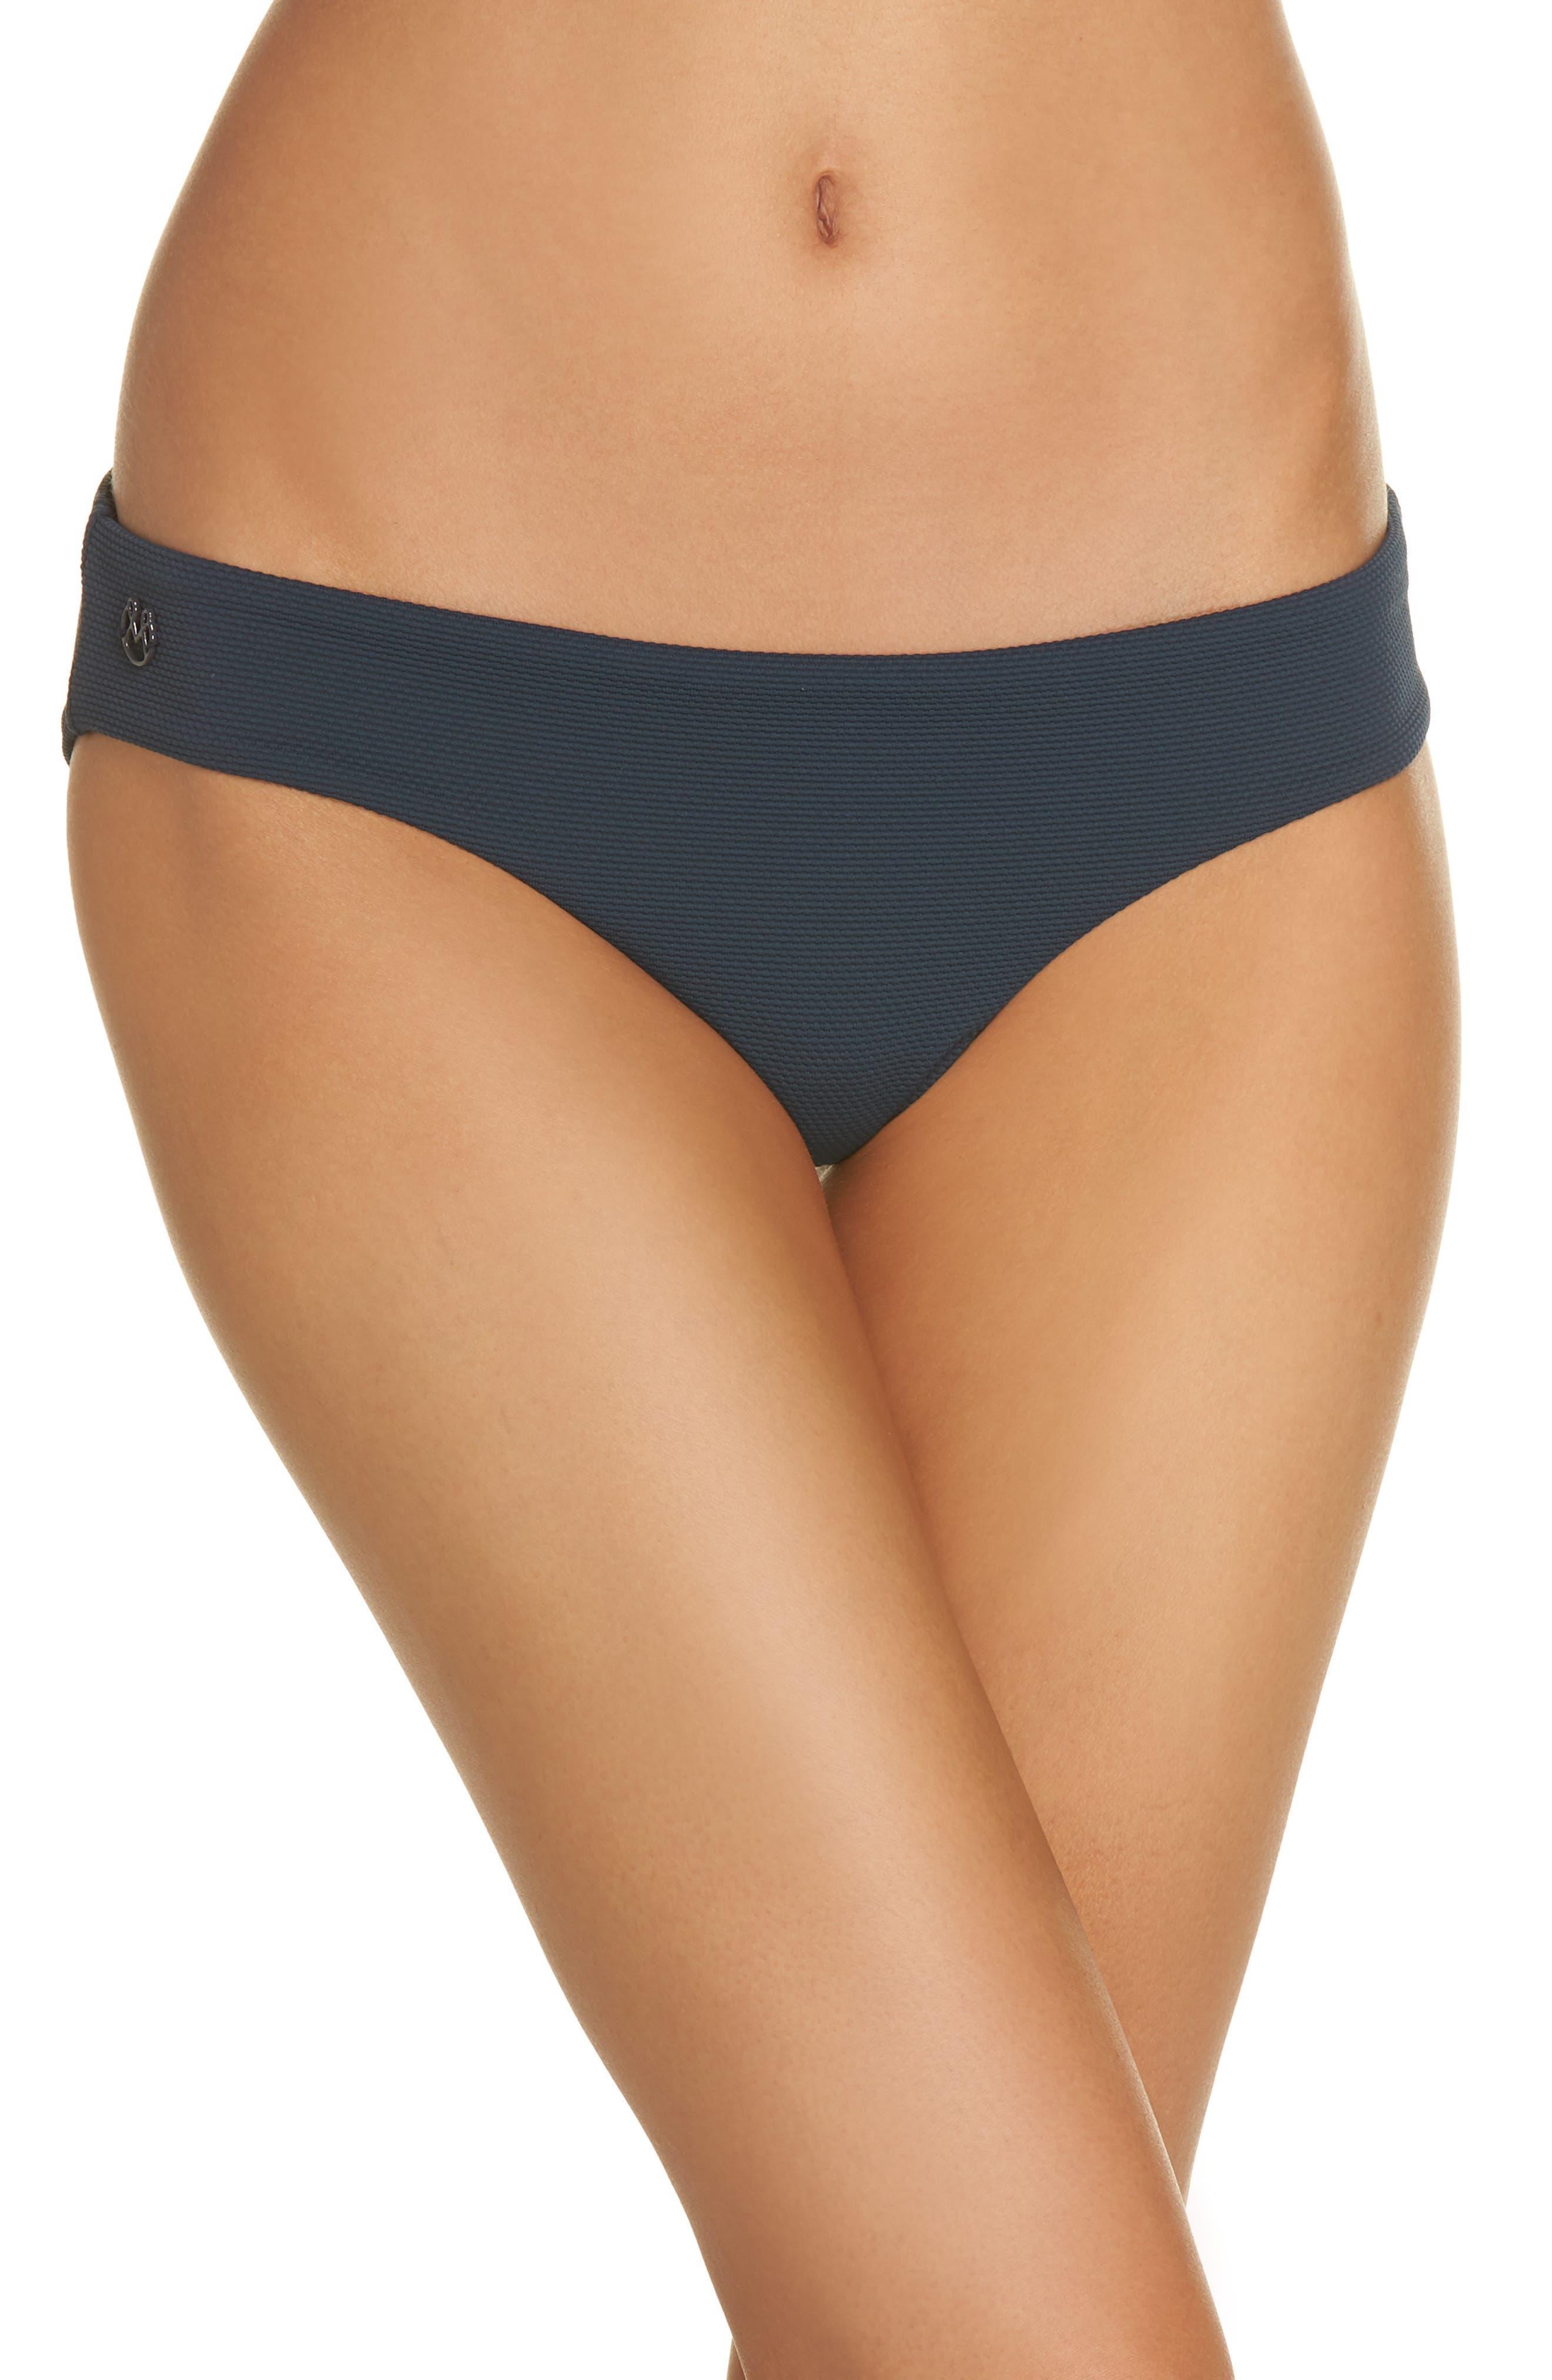 Stargazer Sublime Signature Reversible Bikini Bottoms,                         Main,                         color, Stargazer